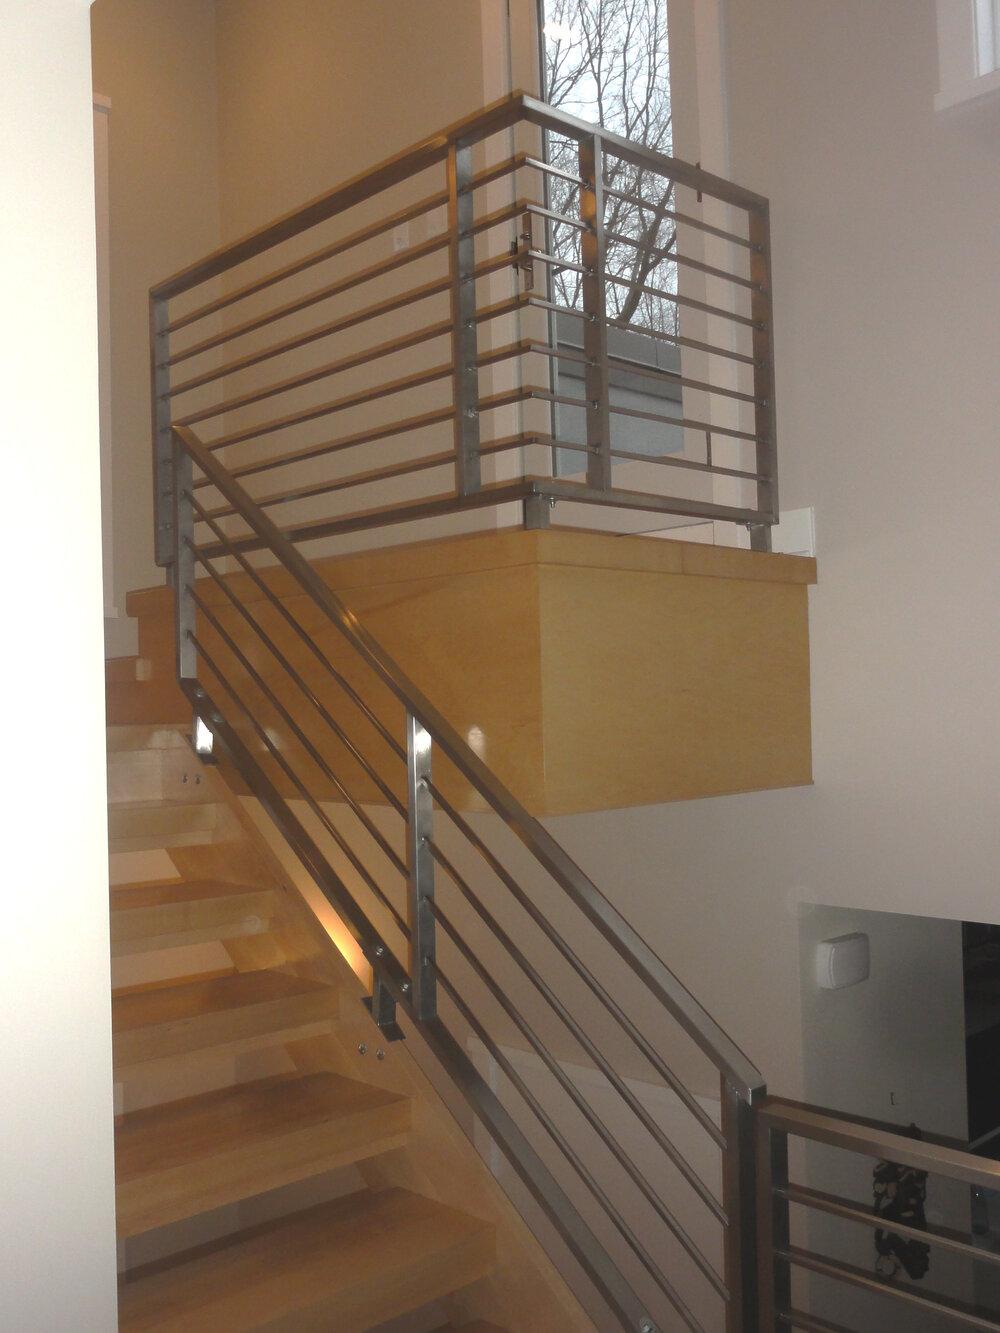 Horizontal railing